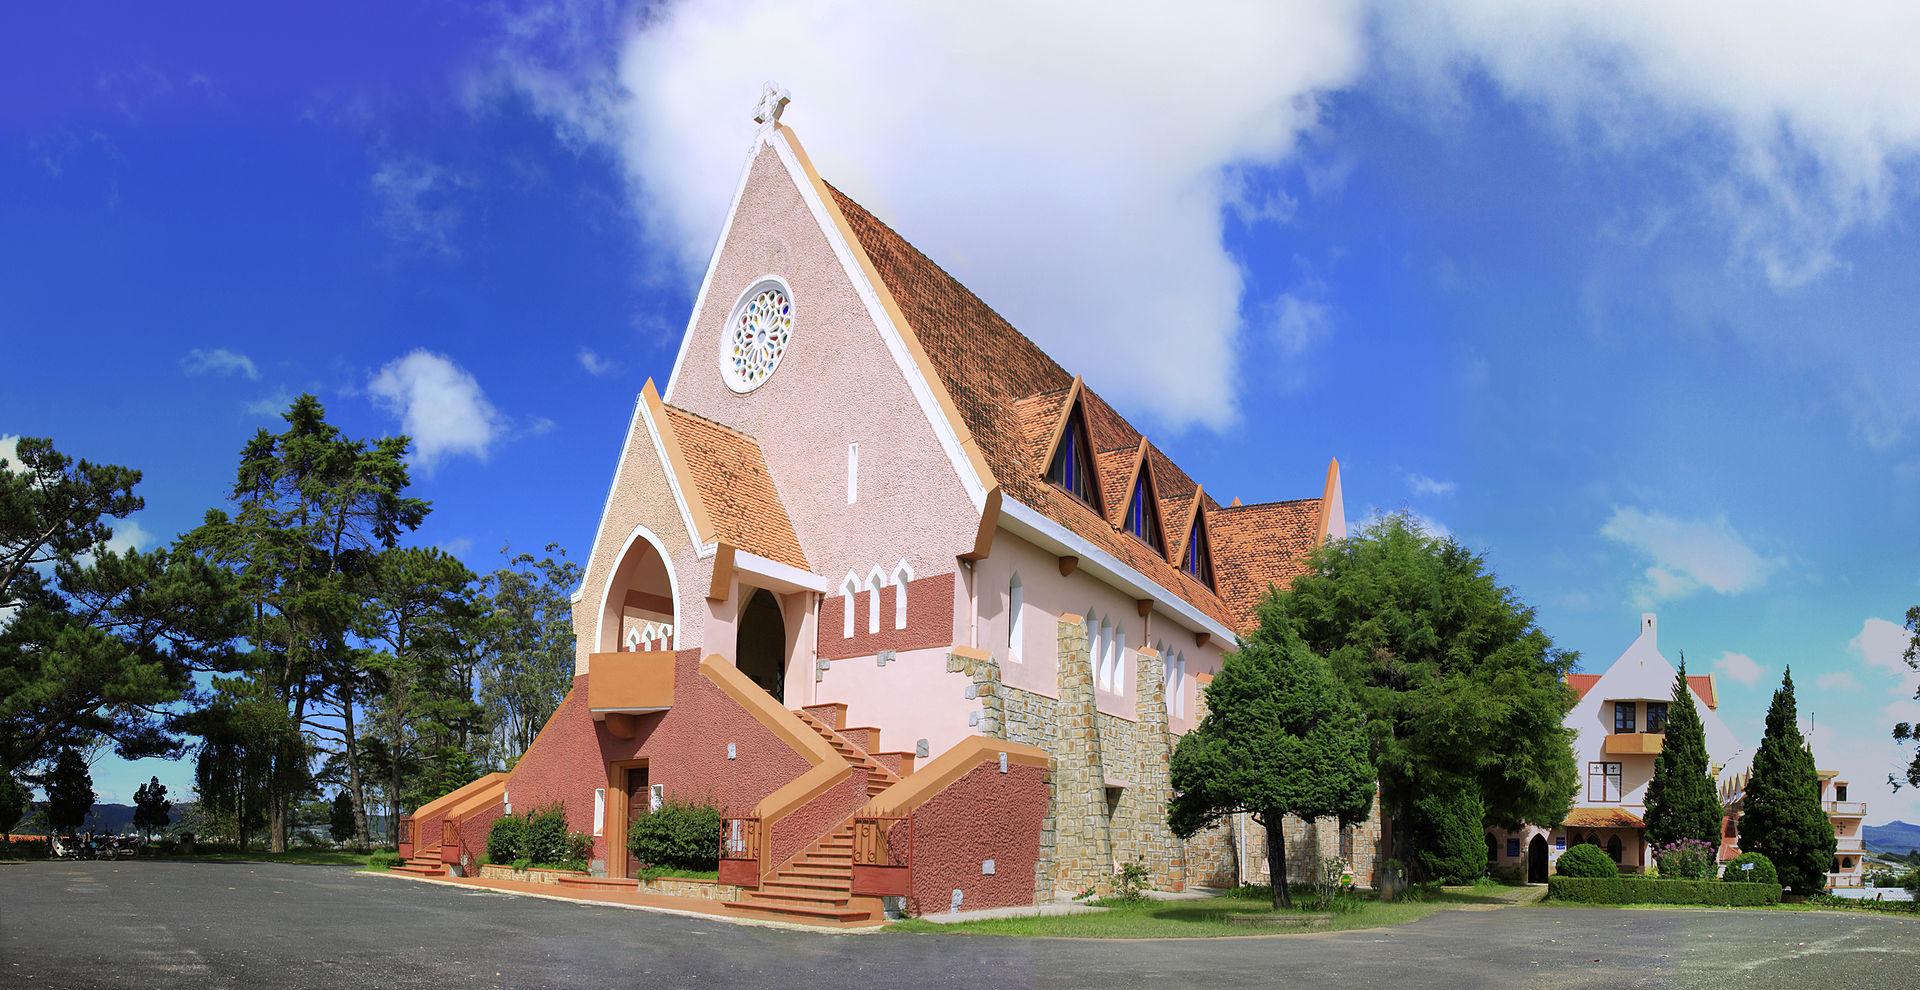 Domain_de_marie_church_90.jpg